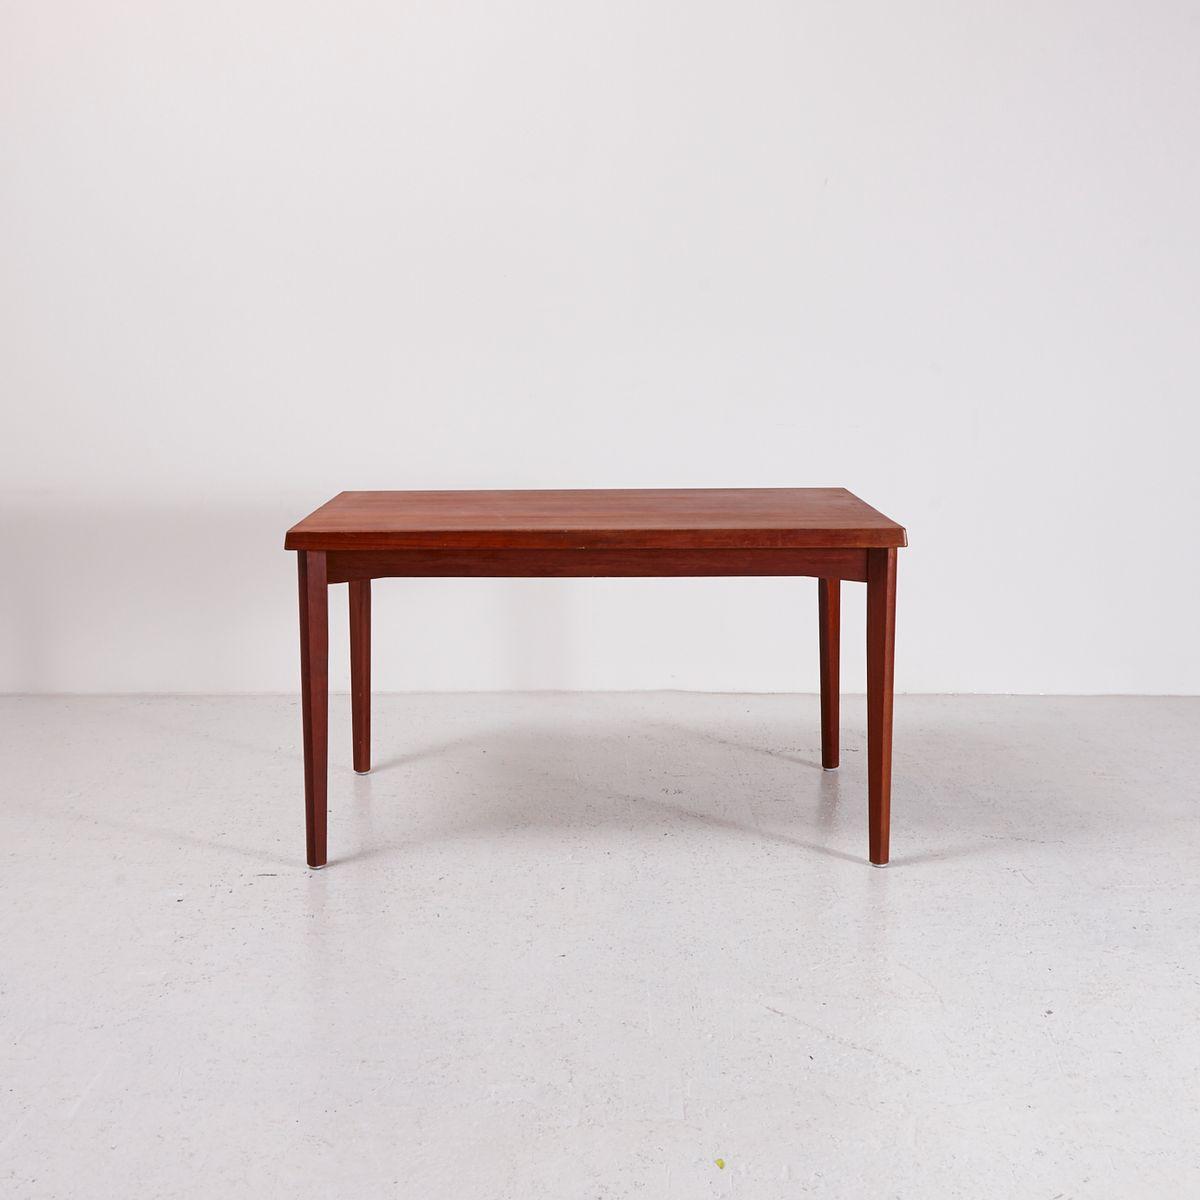 Extendable Teak Dining Table by Henning Kj230rnulf for Vejle  : extendable teak dining table by henning kjaernulf for vejle mobelfabrik 1960s 1 from www.pamono.co.uk size 1200 x 1200 jpeg 49kB